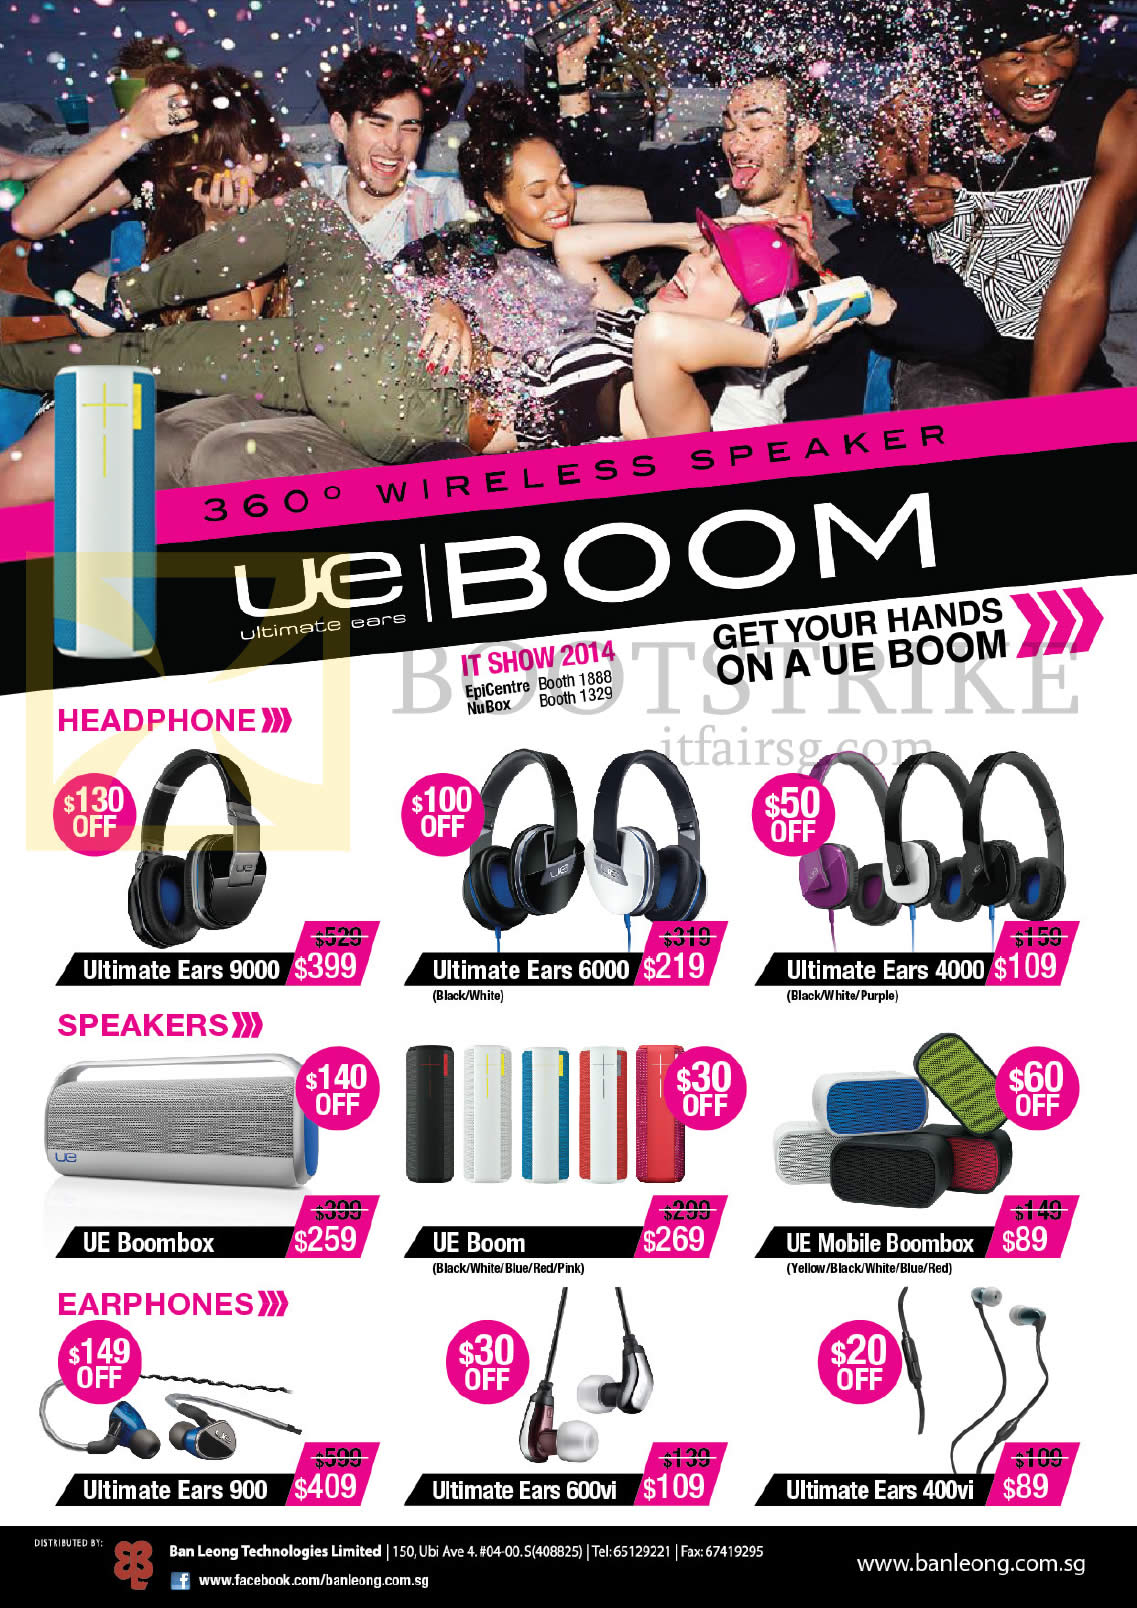 IT SHOW 2014 price list image brochure of Logitech Headphones, Speakers, Earphones, Ultimate Ears 9000, 6000, 4000, 900, 600M, 400vi, UE Boom, Mobile Boombox, Boombox